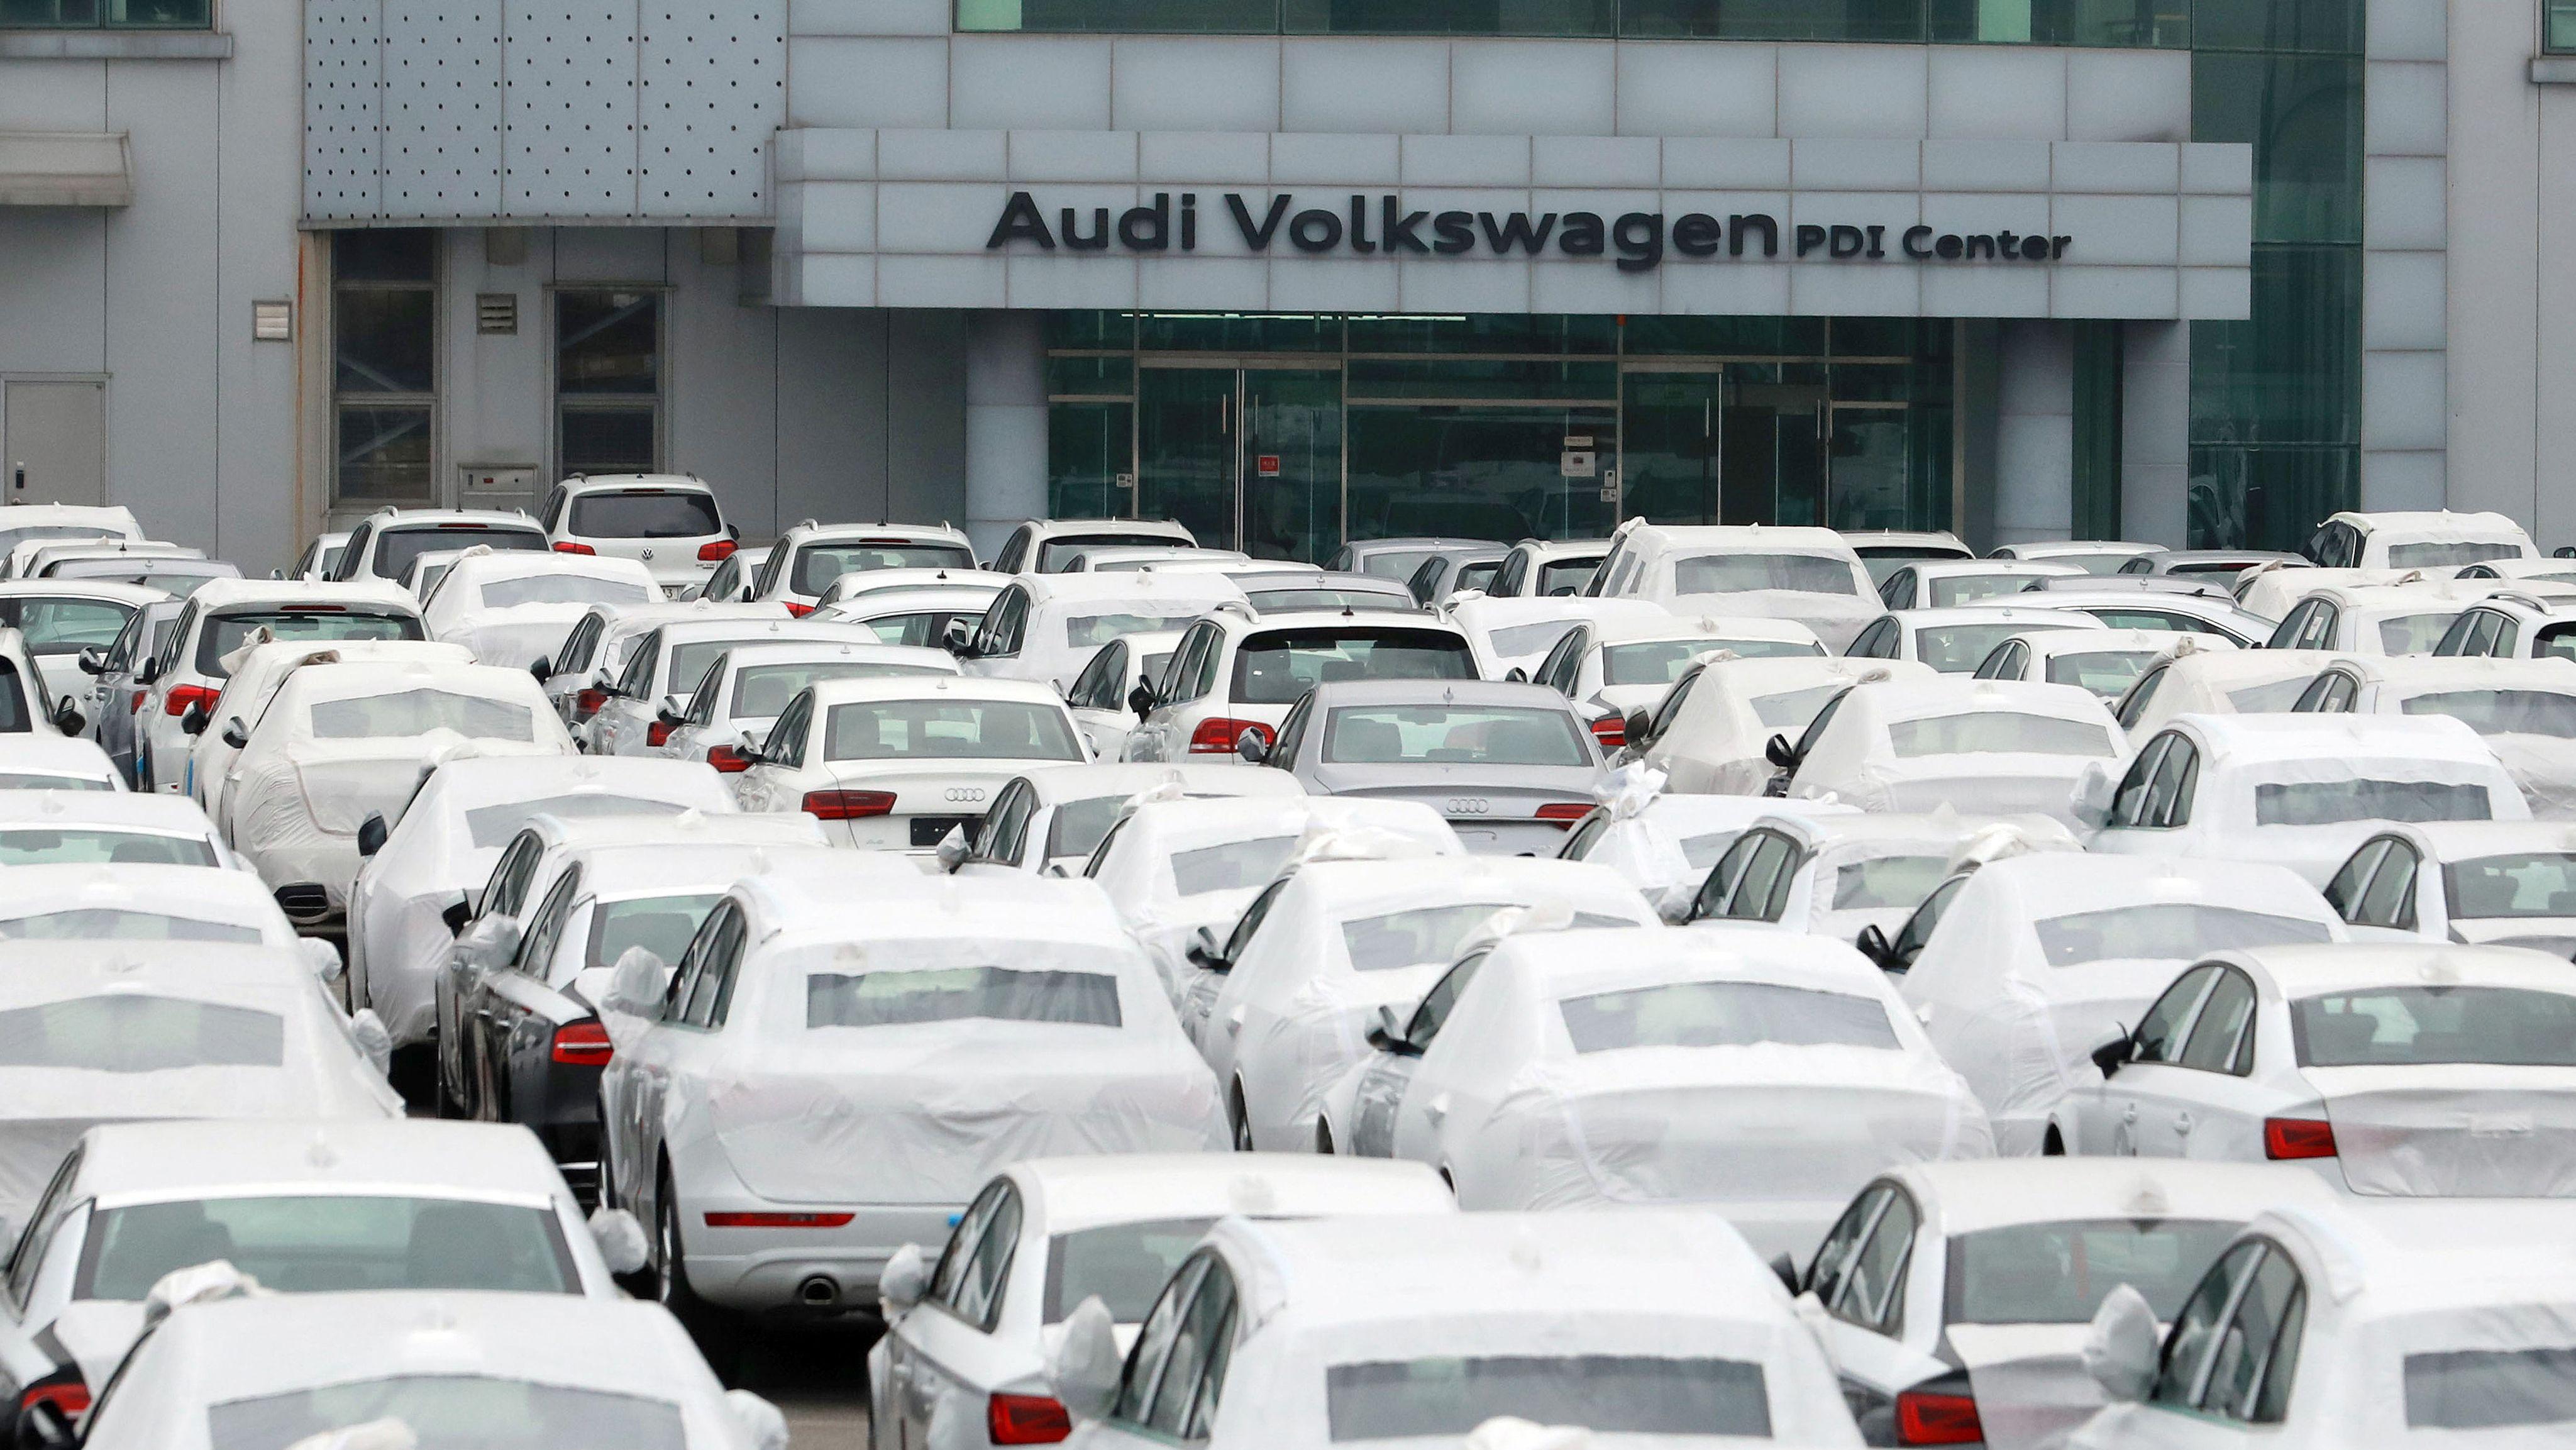 Volkswagen und Audi Fahrzeuge in Pyeongtaek, Südkorea, 2016